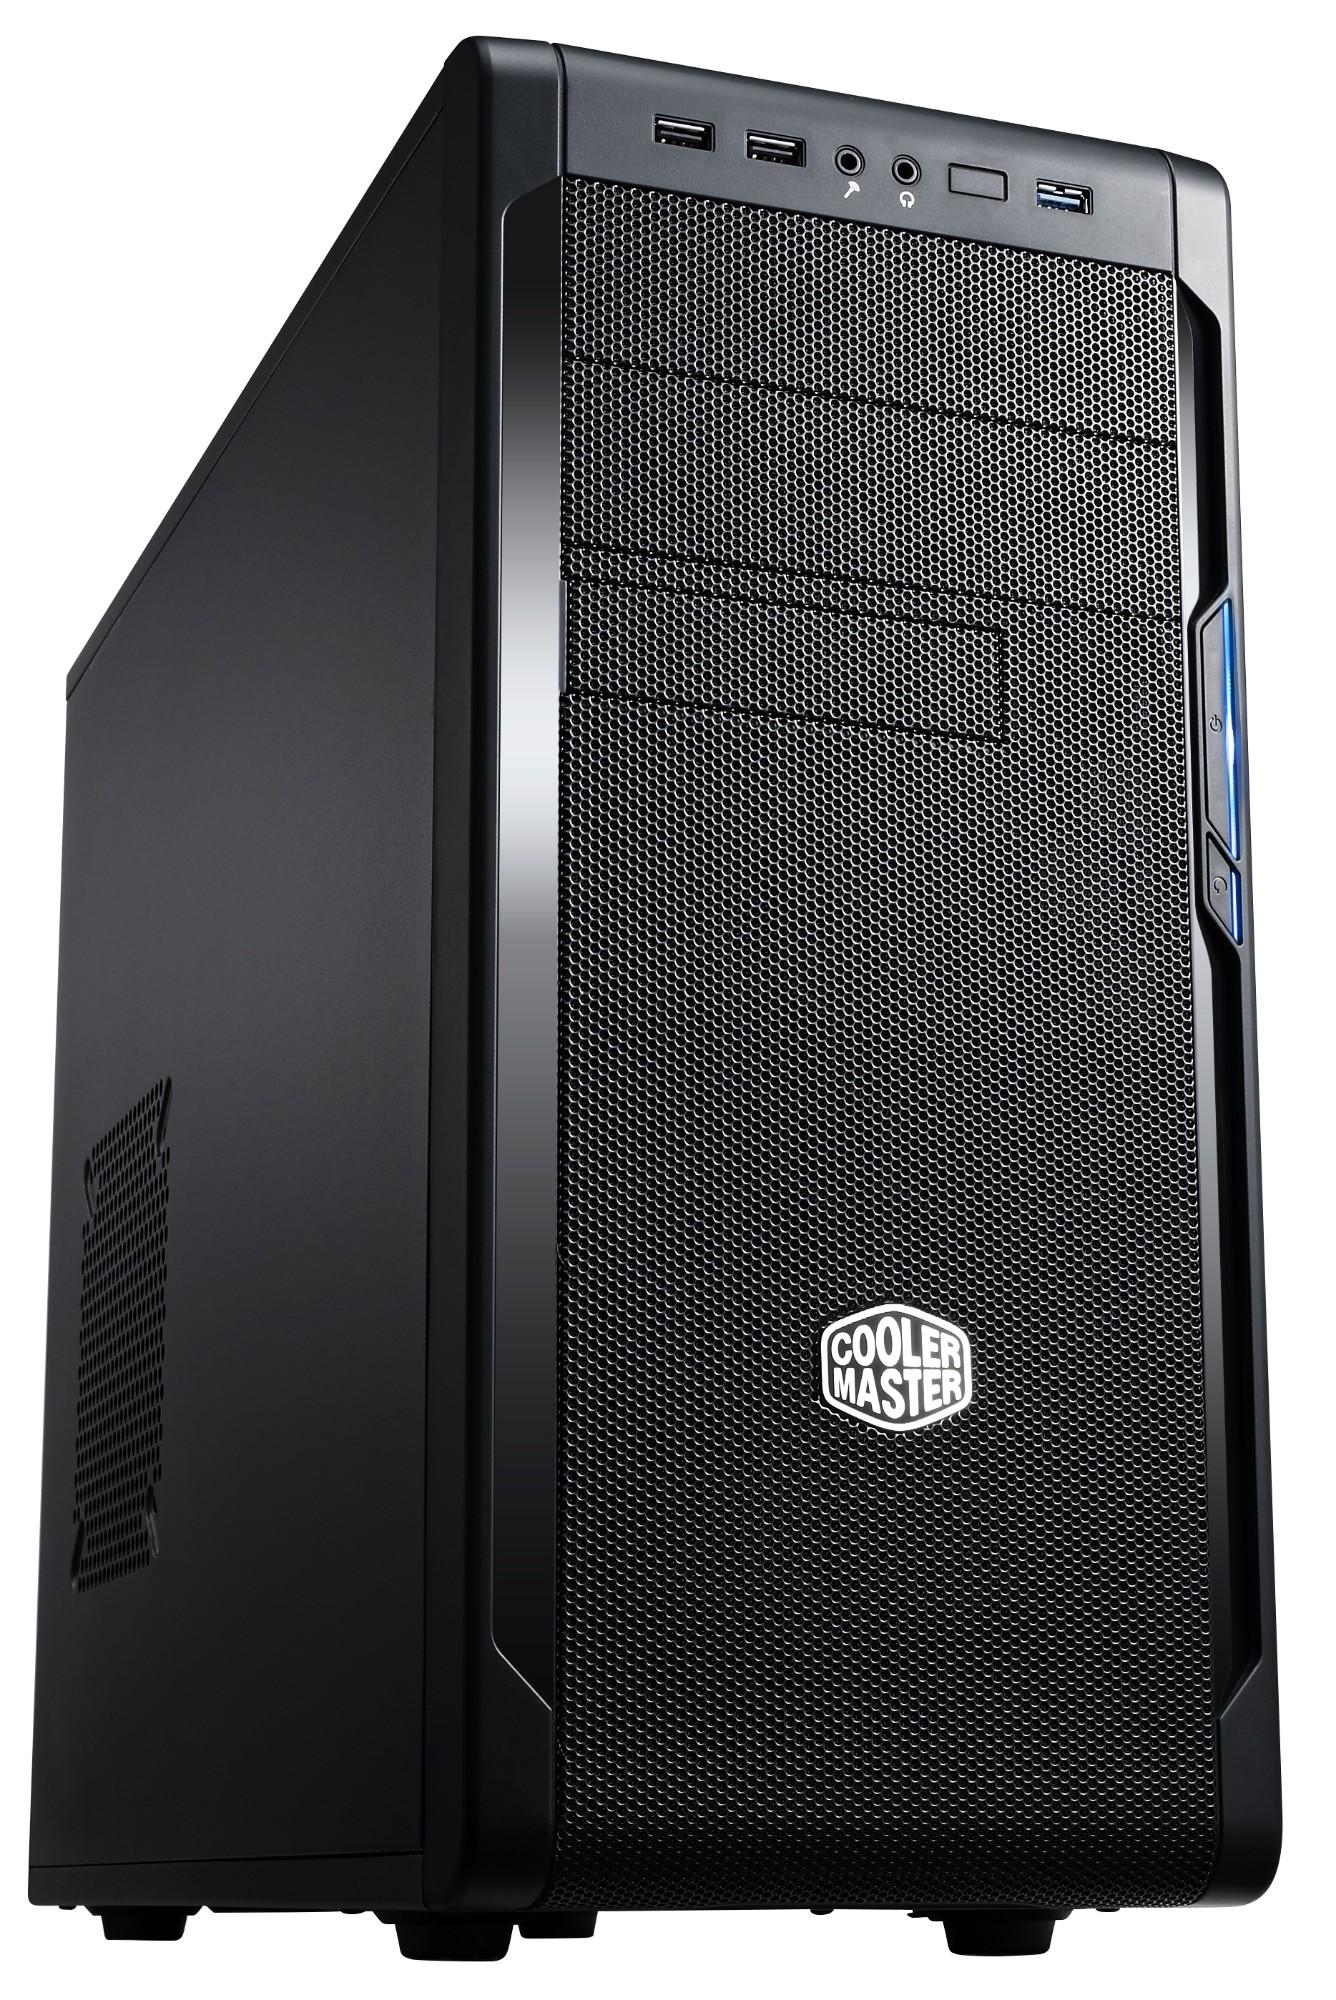 Cooler Master N300 Midi-Tower Black computer case